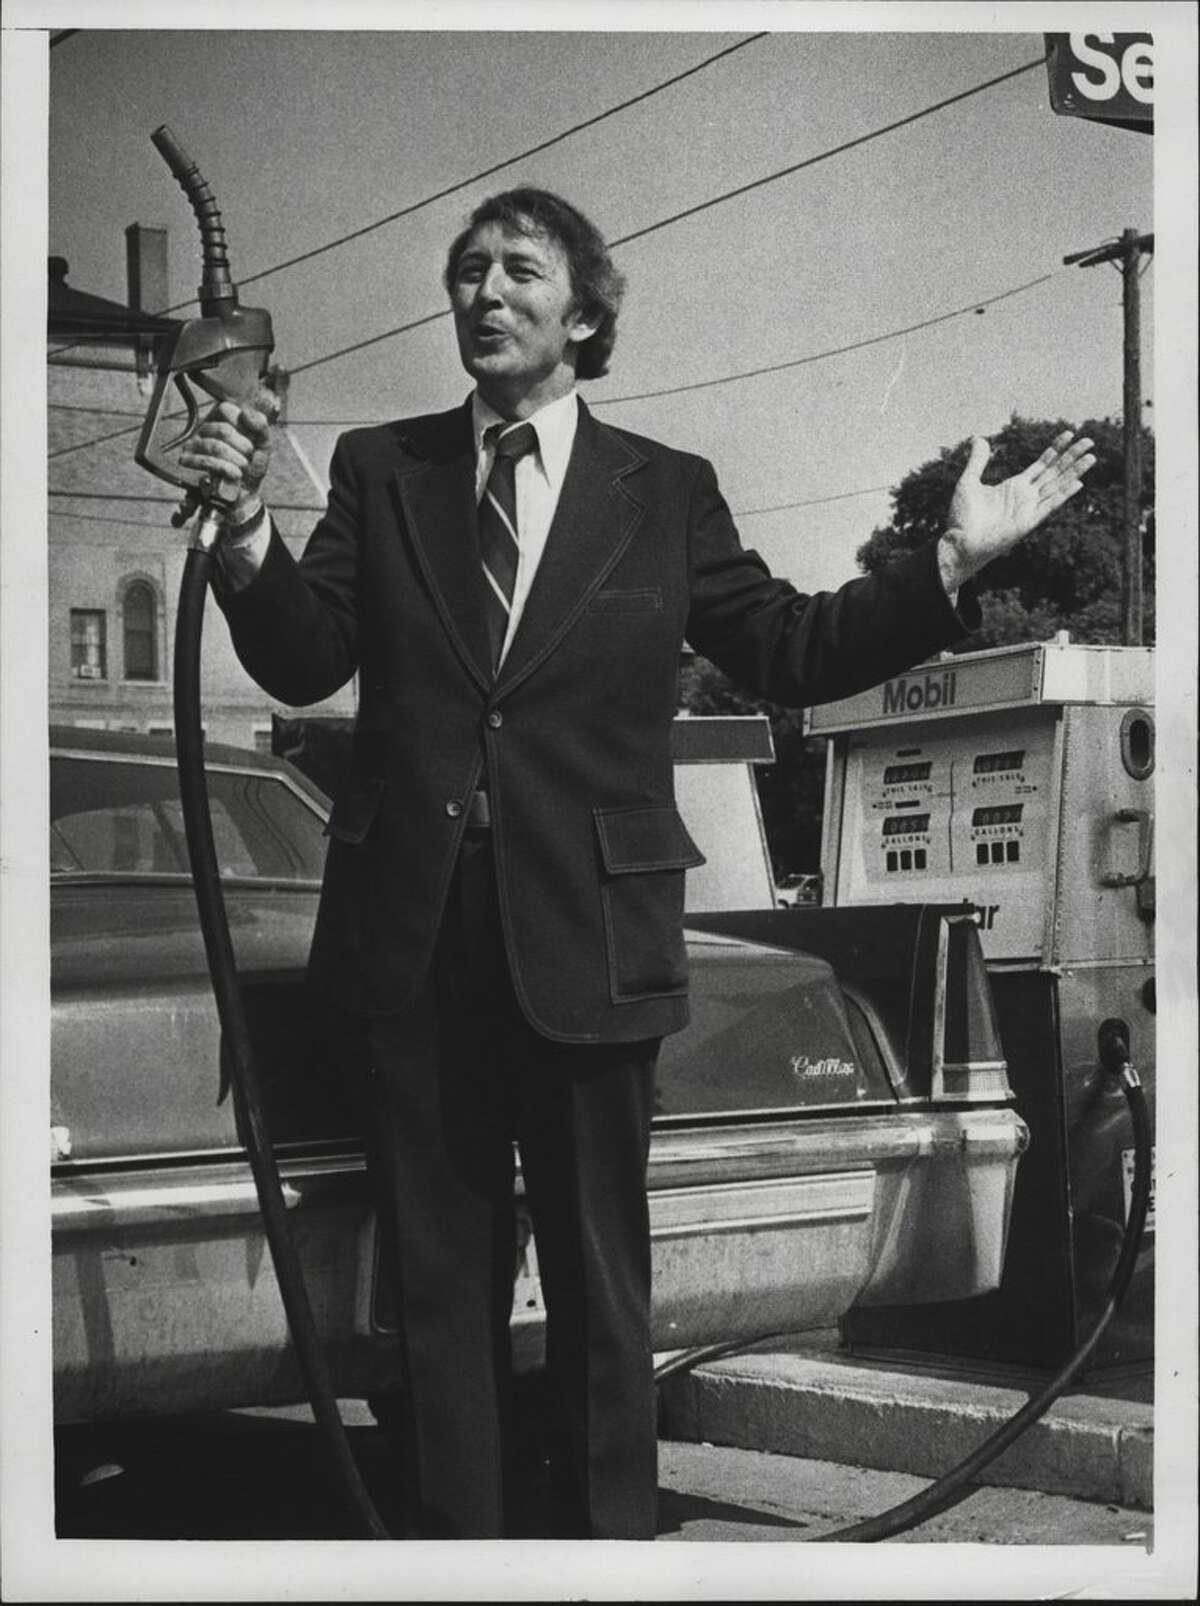 Mayor Raymond Watkin at a Saratoga, New York gas station. July 23, 1979 (Bob Richey/Times Union Archive)